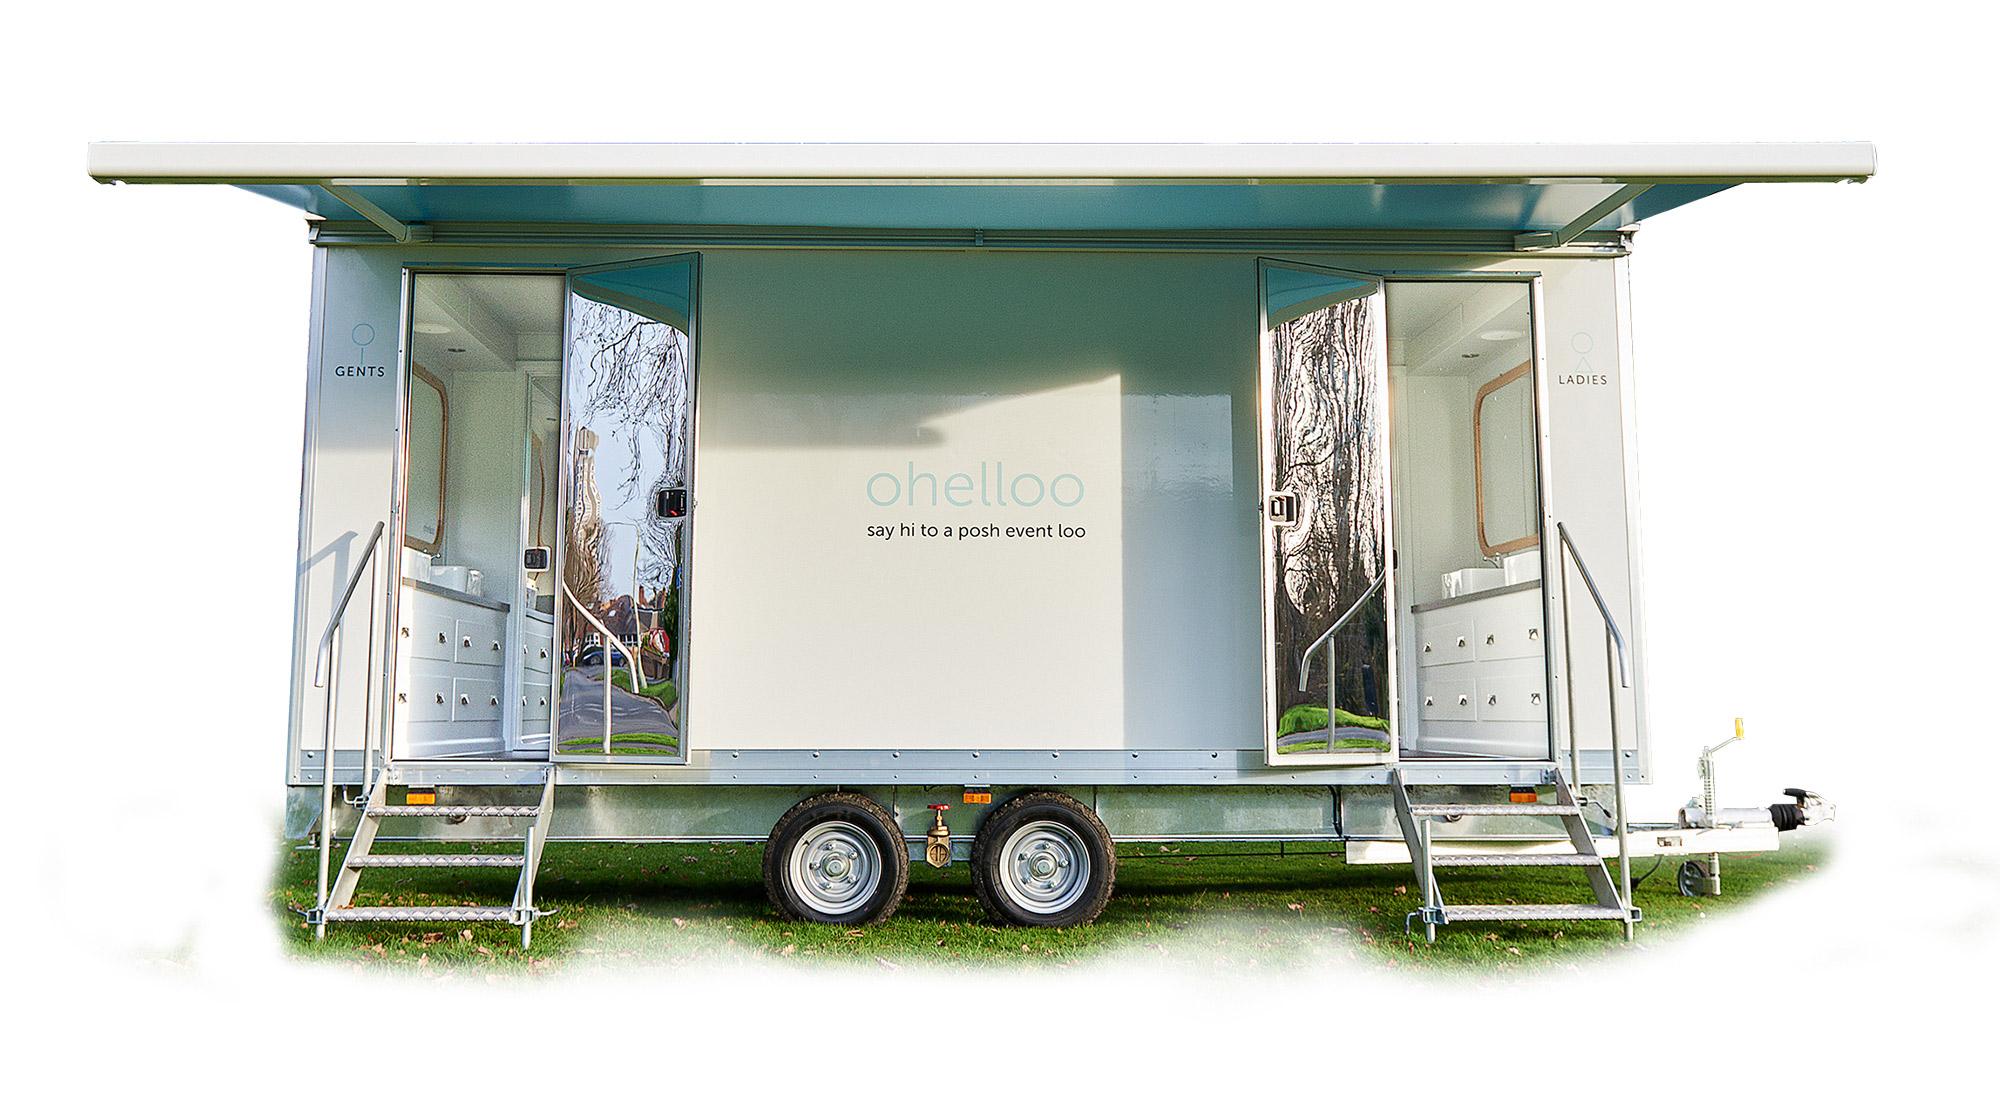 Luxury Toilet Hire | Posh Portable Loos | Portable Toilets for Weddings